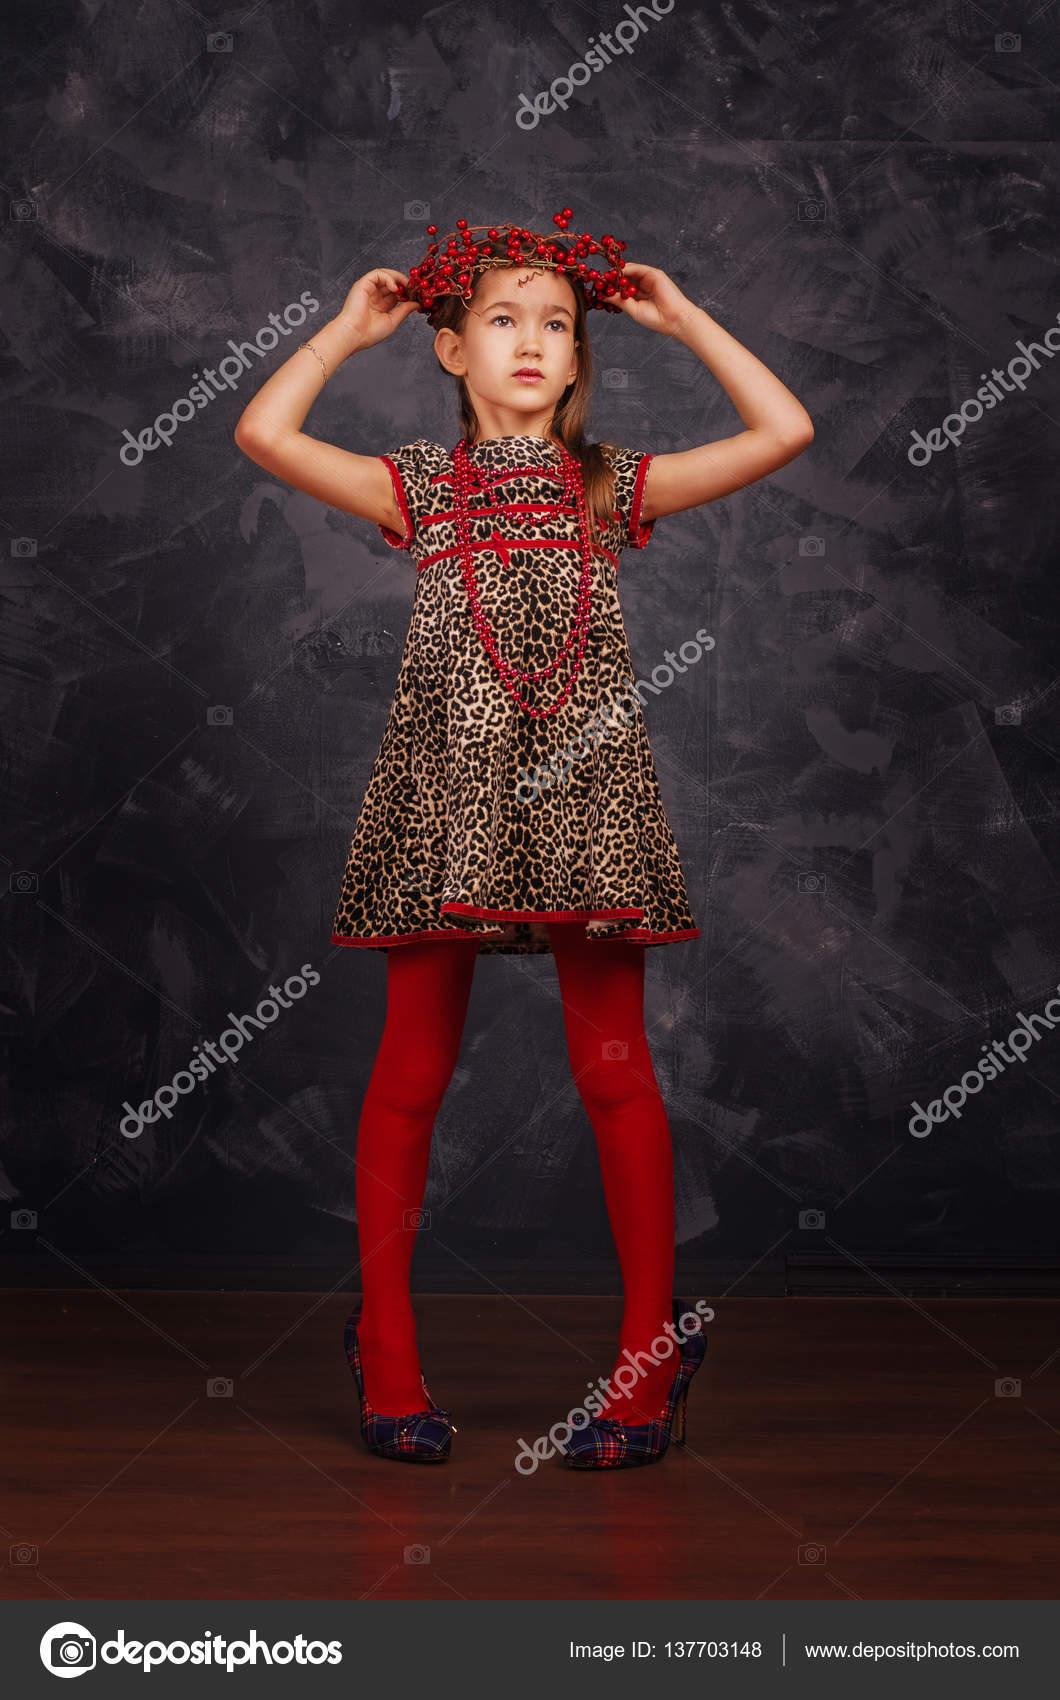 3d2fb6744fa Αρκετά μικρό κορίτσι που φοράει το όμορφο φόρεμα. Φοράει κόκκινο χάντρες  και στεφάνι. Studio που γυρίστηκε– εικόνα αρχείου